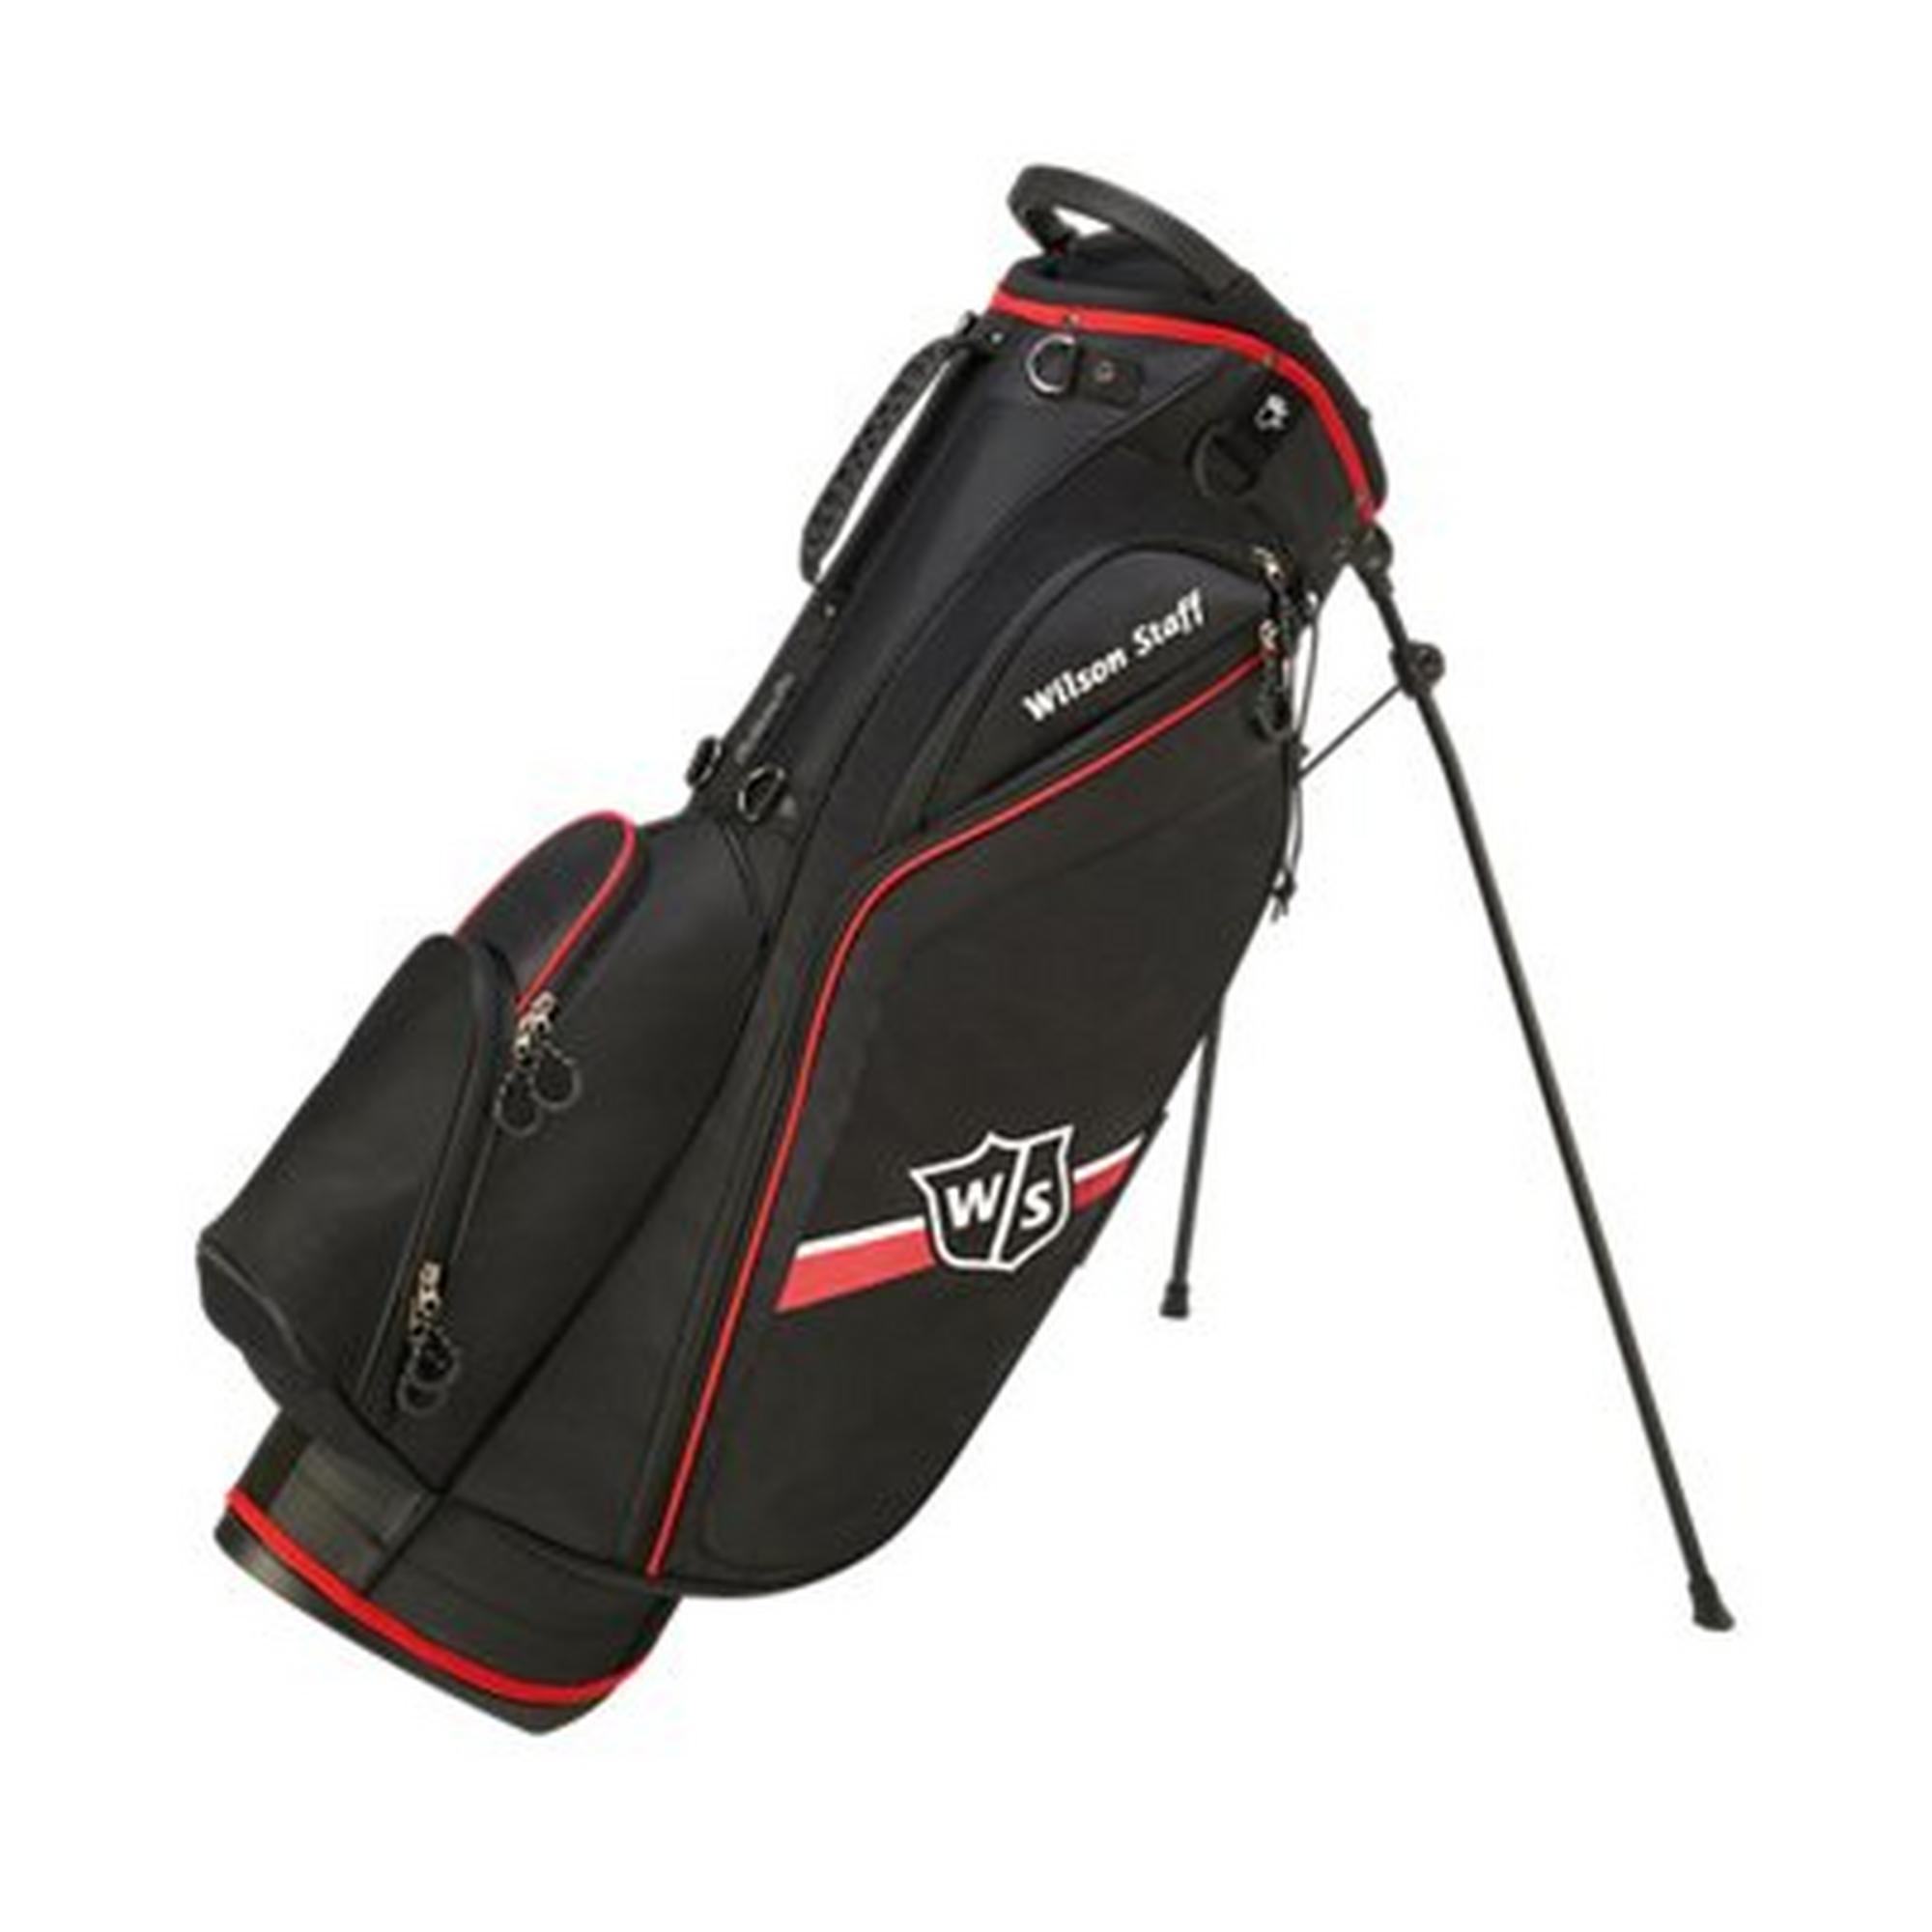 W/S Lite Stand Bag